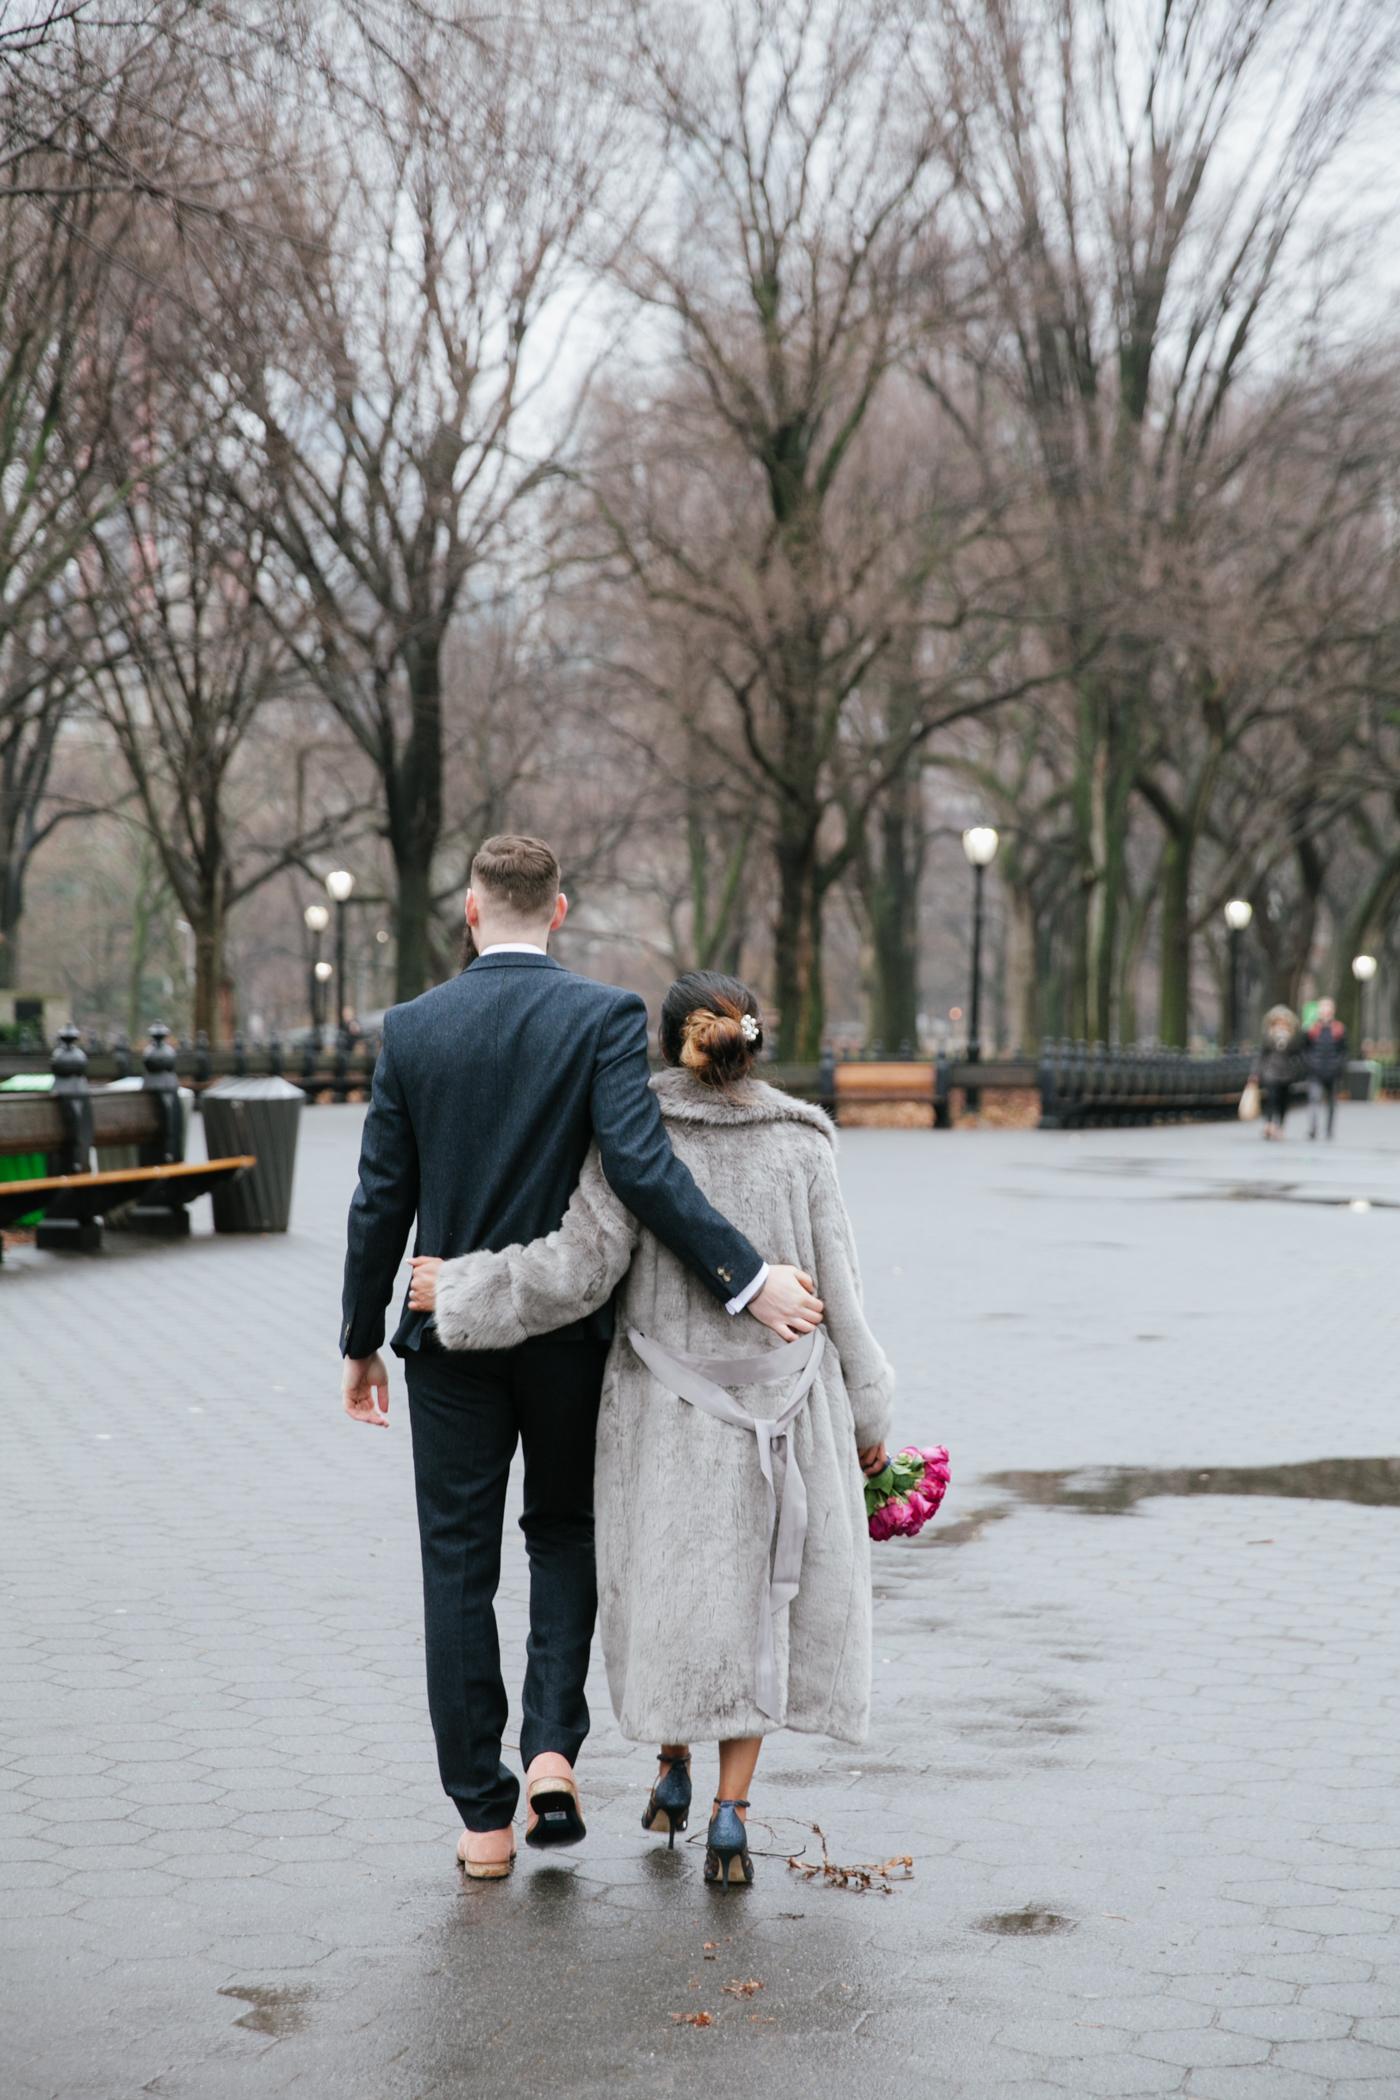 Central-park-wedding-by-Tanya-Isaeva-82.jpg